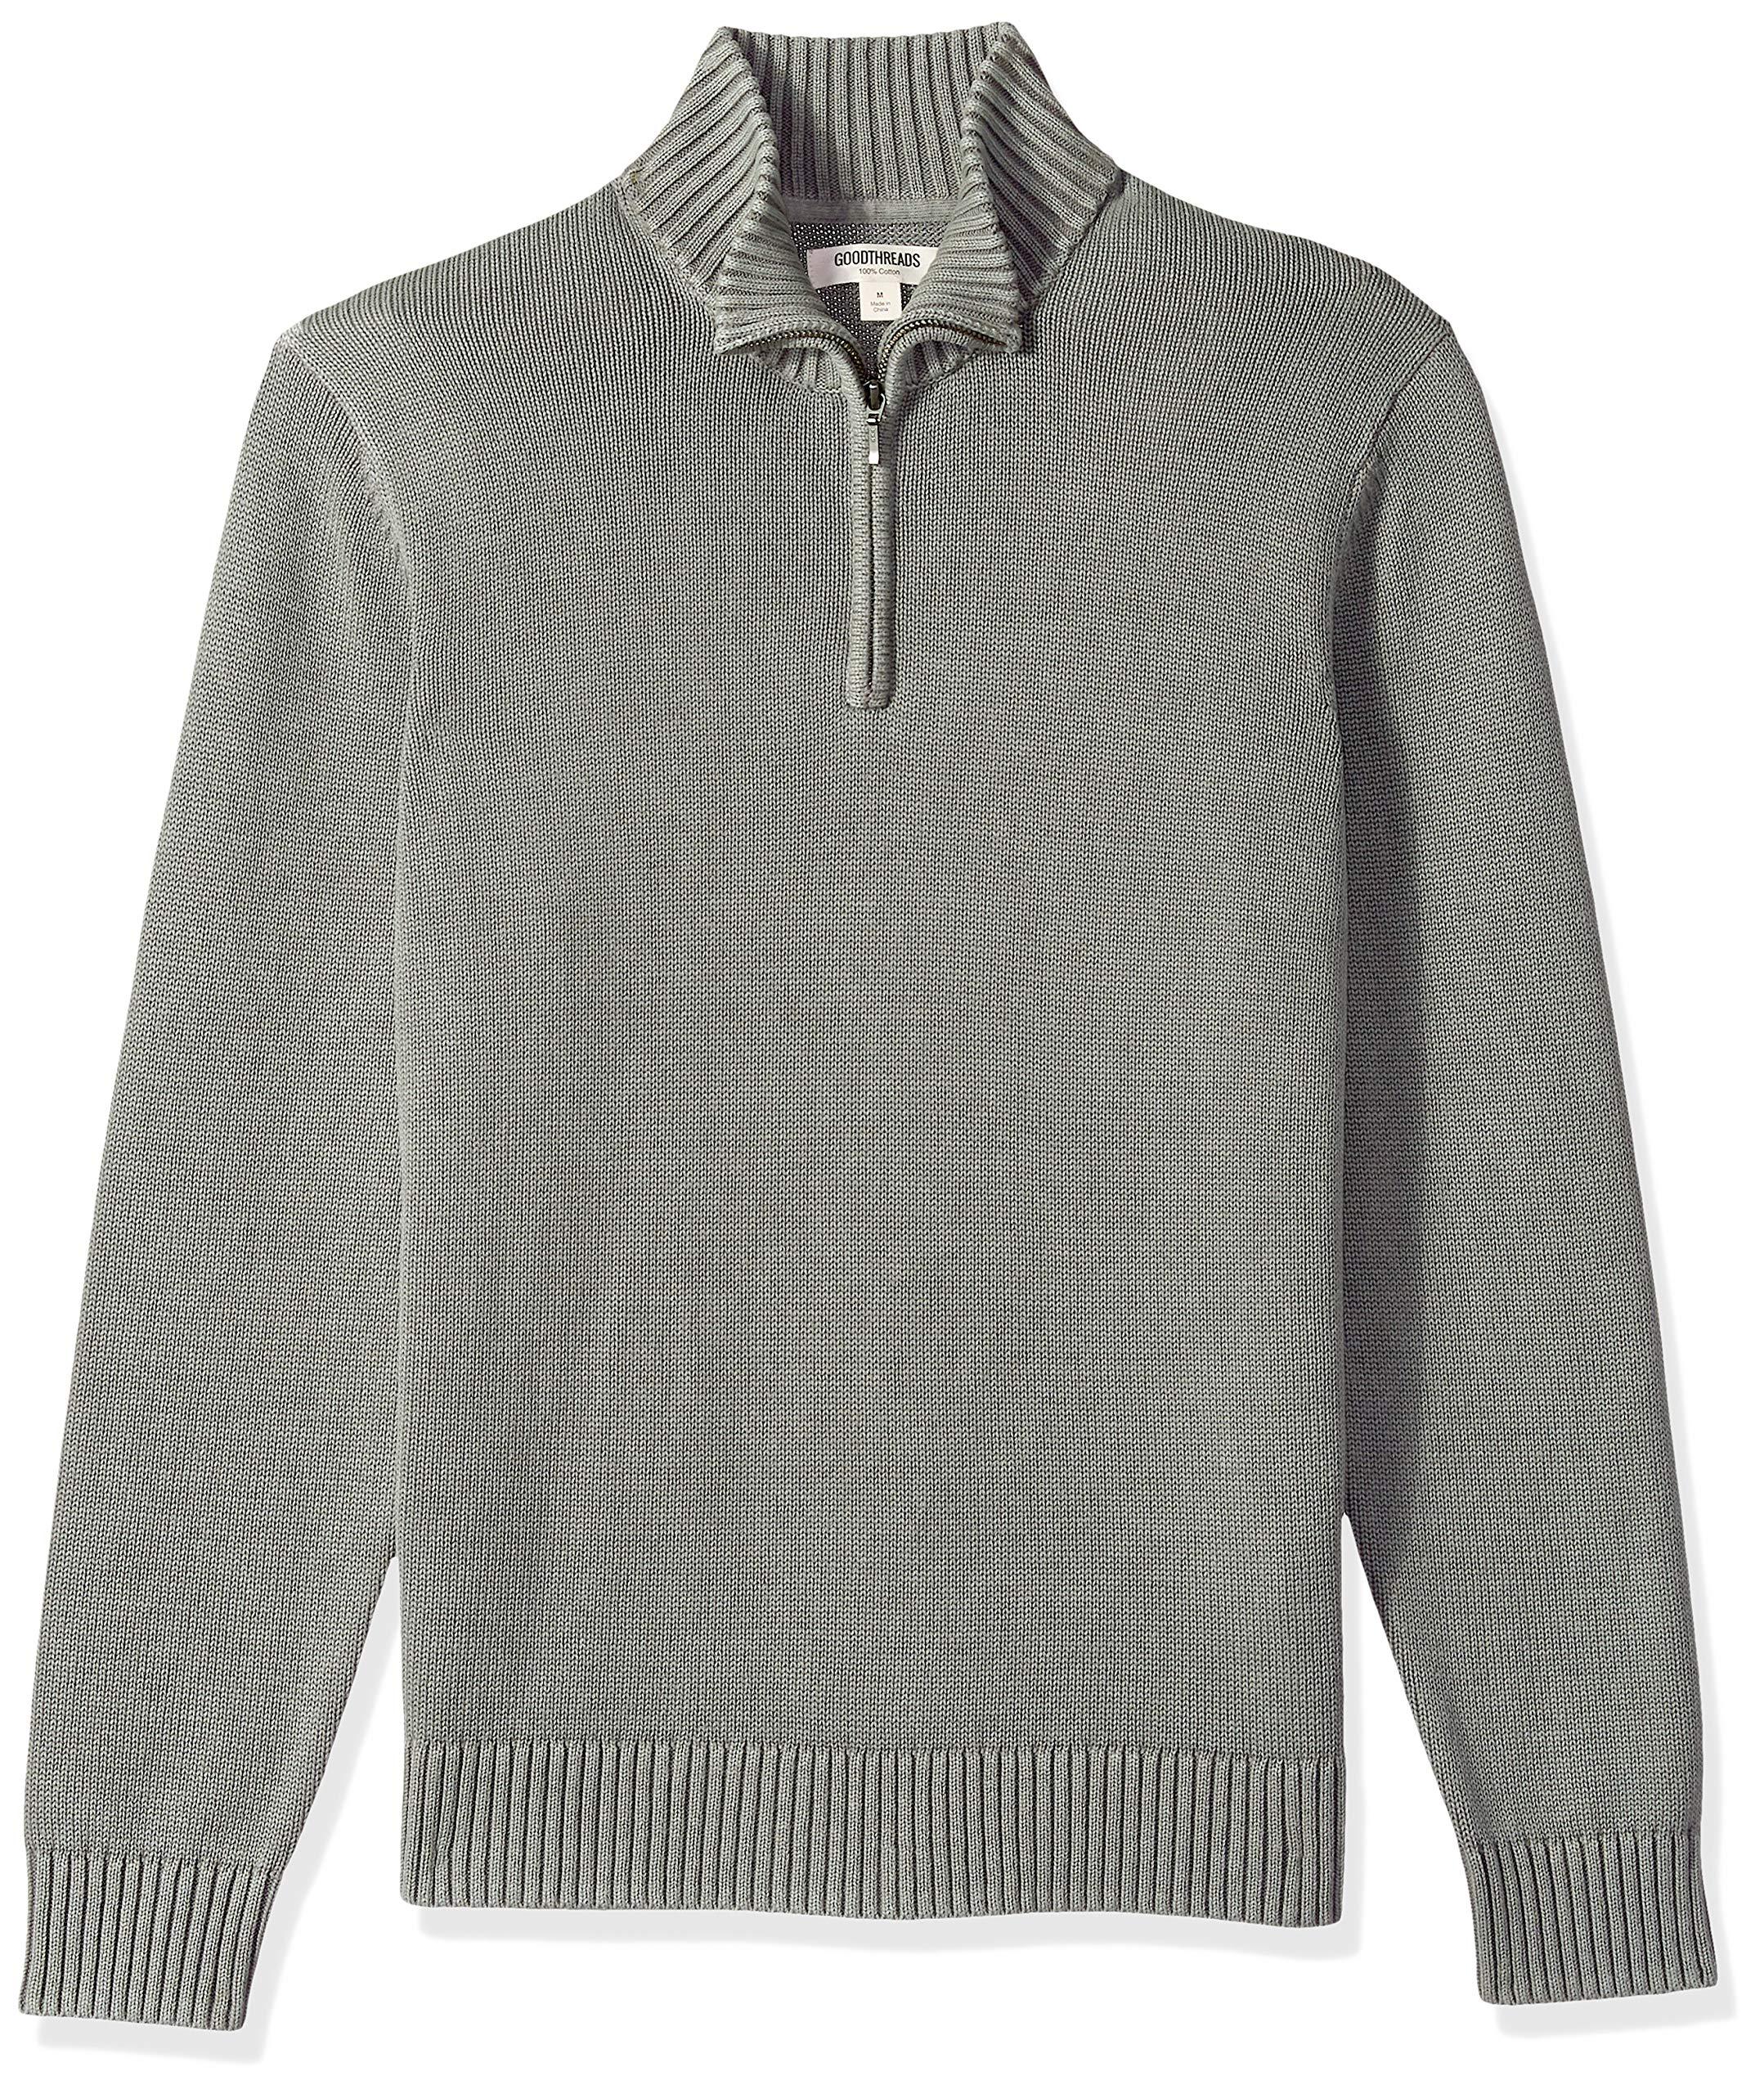 Goodthreads Men's Soft Cotton Quarter Zip Sweater, Washed Grey, X-Large